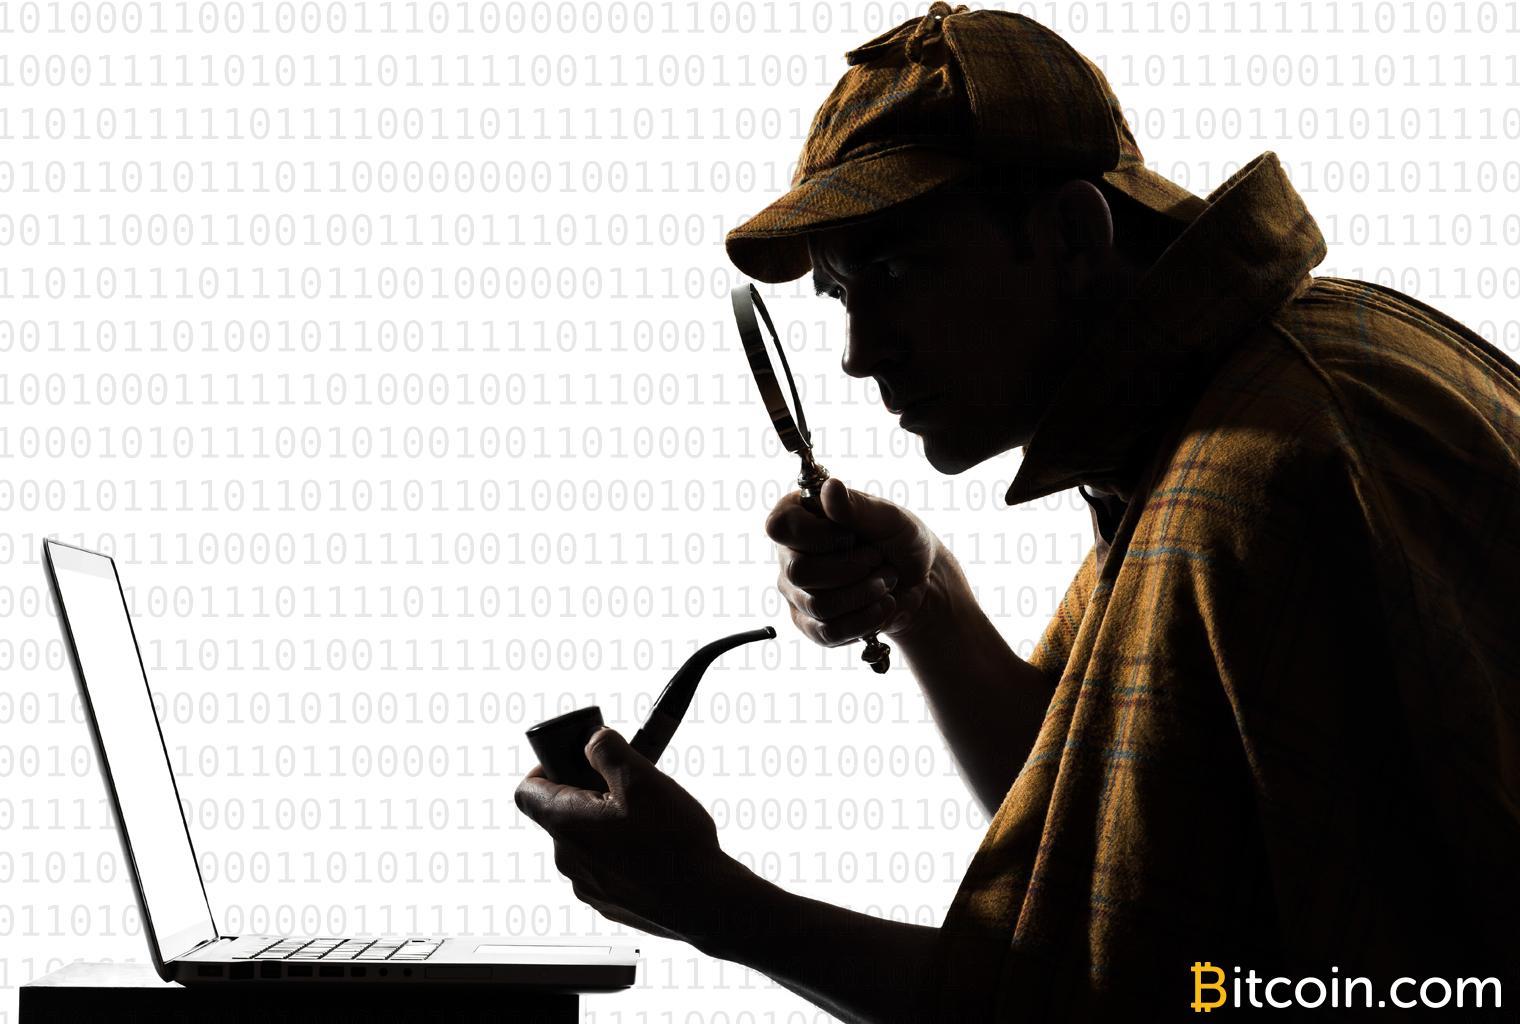 Blockchain Researchers Mock Craig Wright's Unsealed Bitcoin Address List